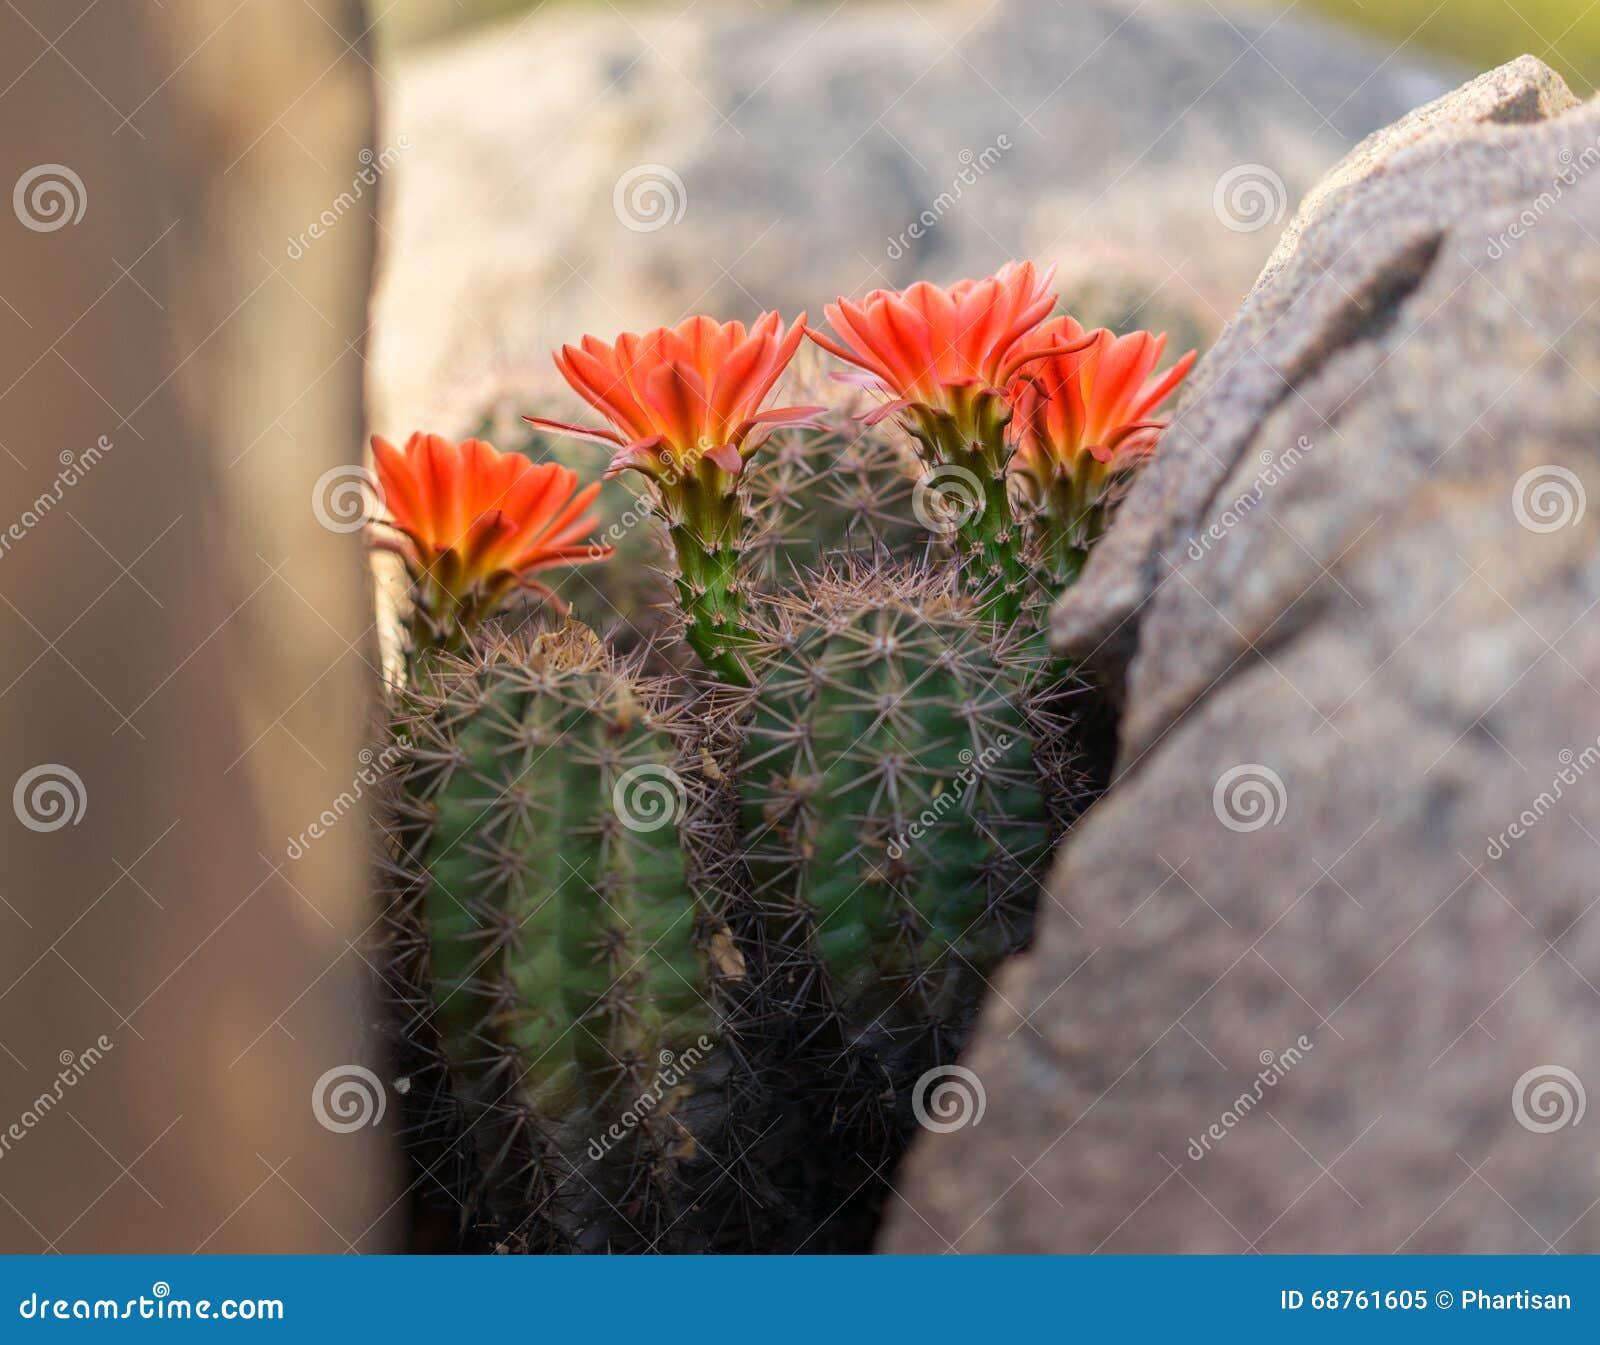 Wild desert spring bloom cactus flowers stock image image of wild desert spring bloom cactus flowers mightylinksfo